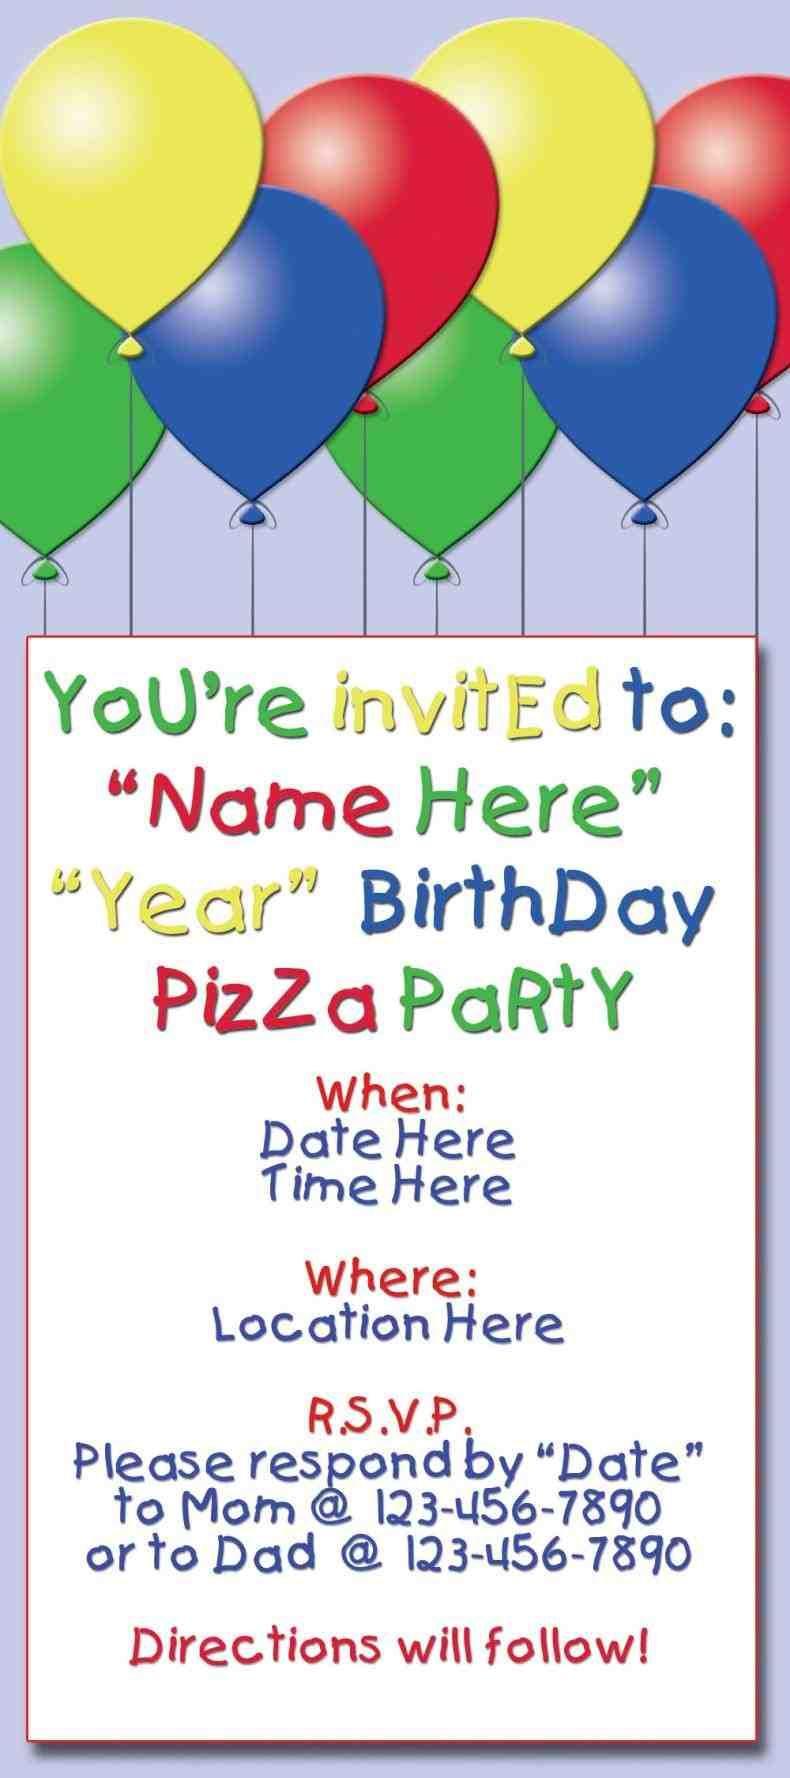 berdon\'s 4th birthday party. balloon invitation front. full size of ...